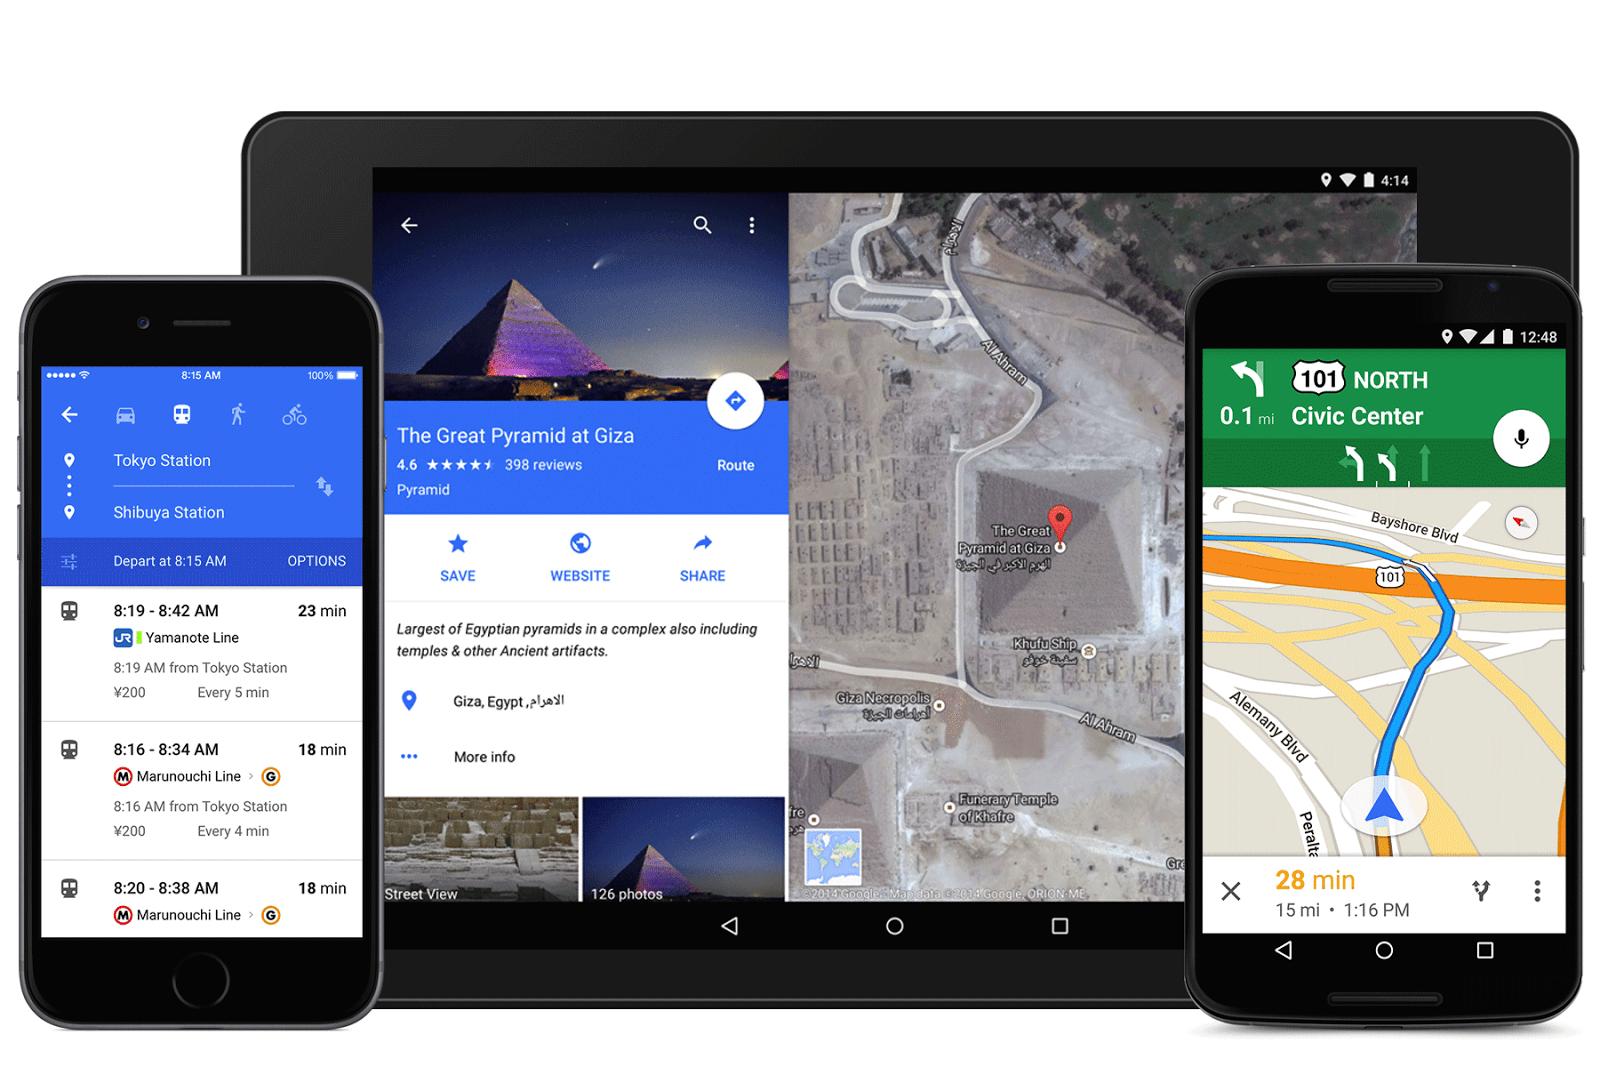 The new Google Maps app